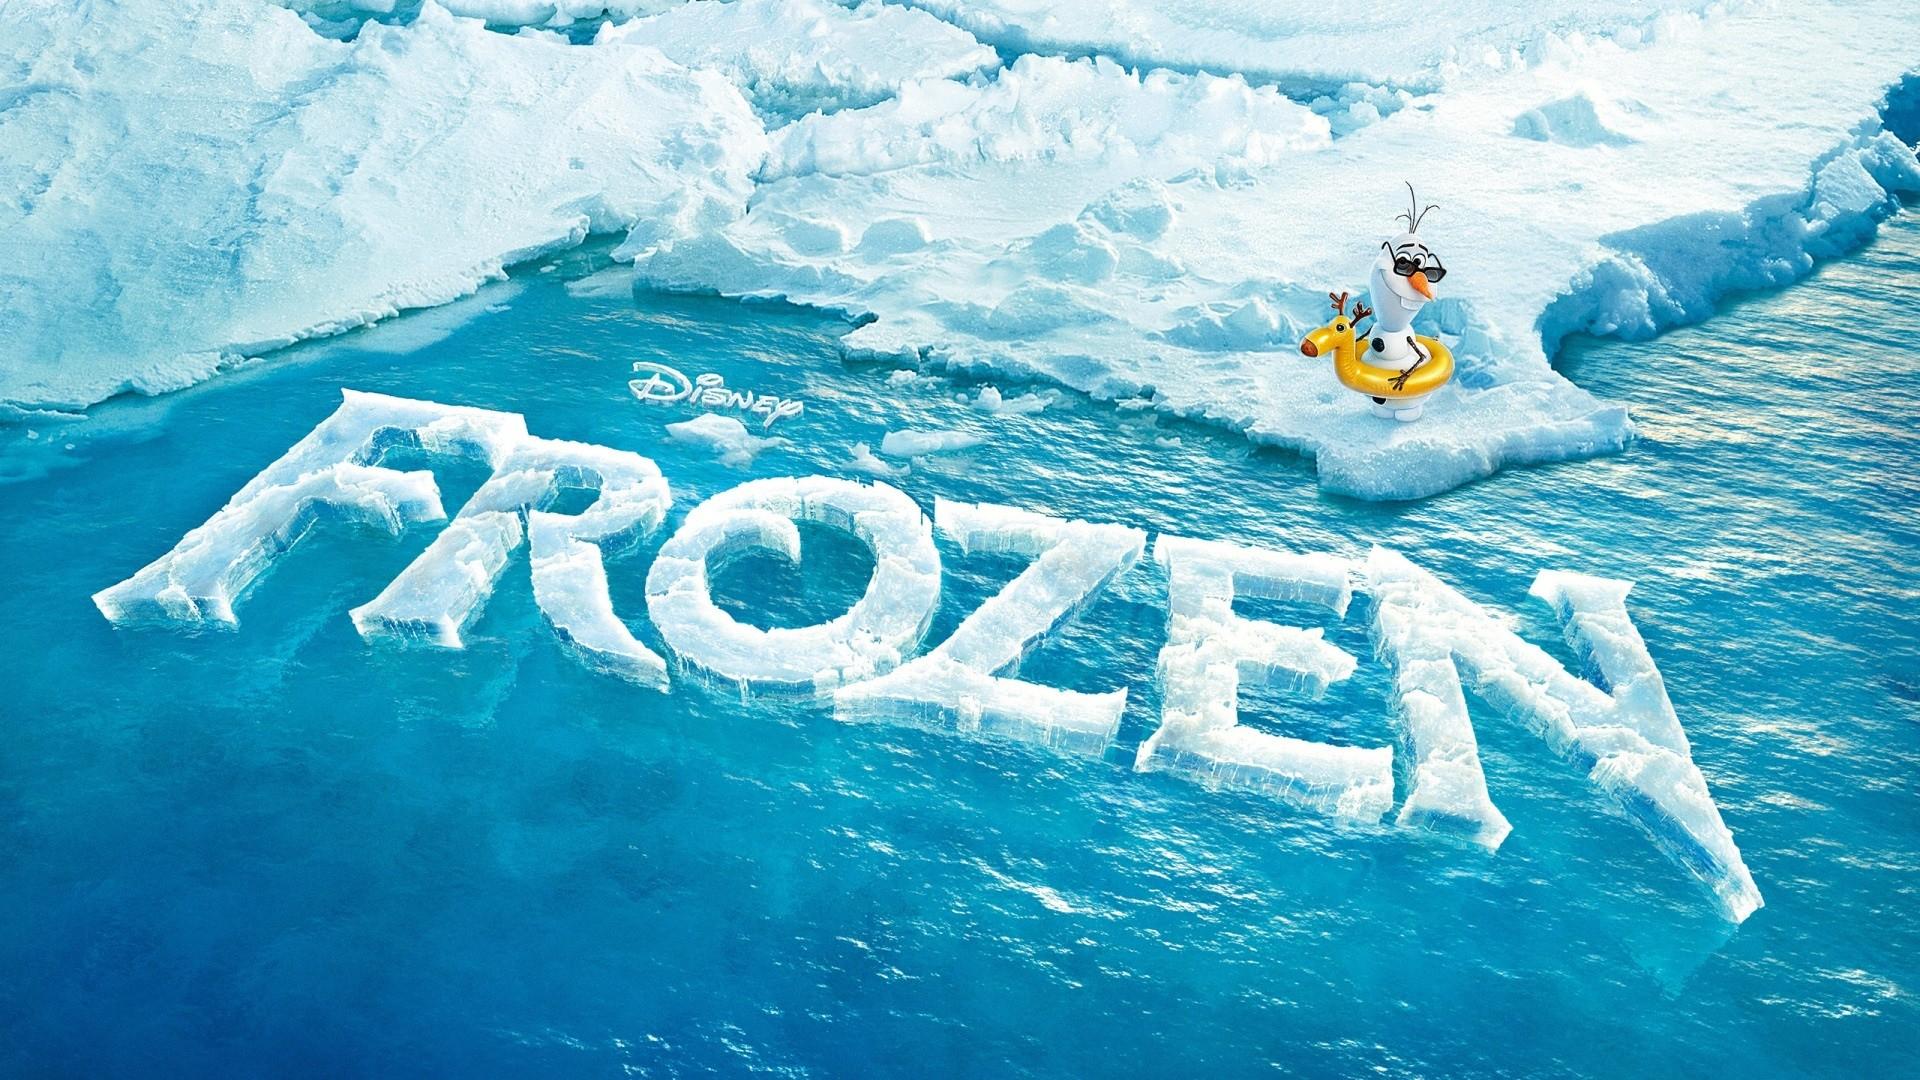 Frozen Ice disney wallpaper background 1920x1080